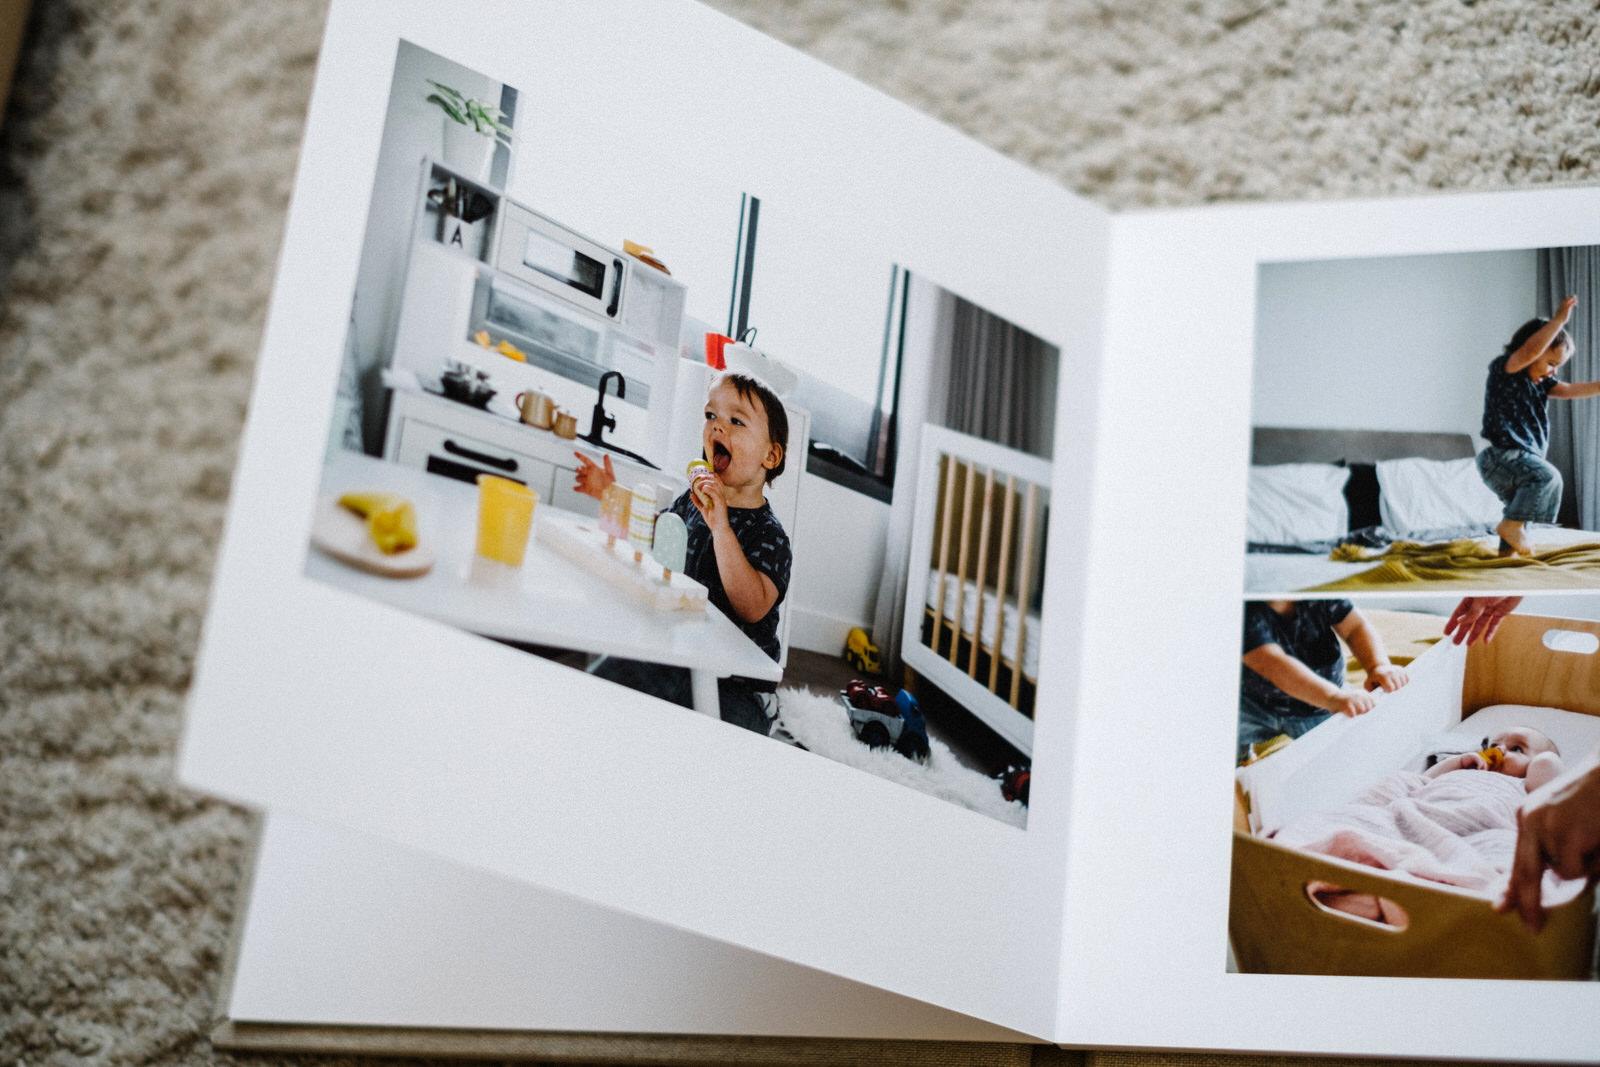 family-story-photos-photo-album-03.jpg